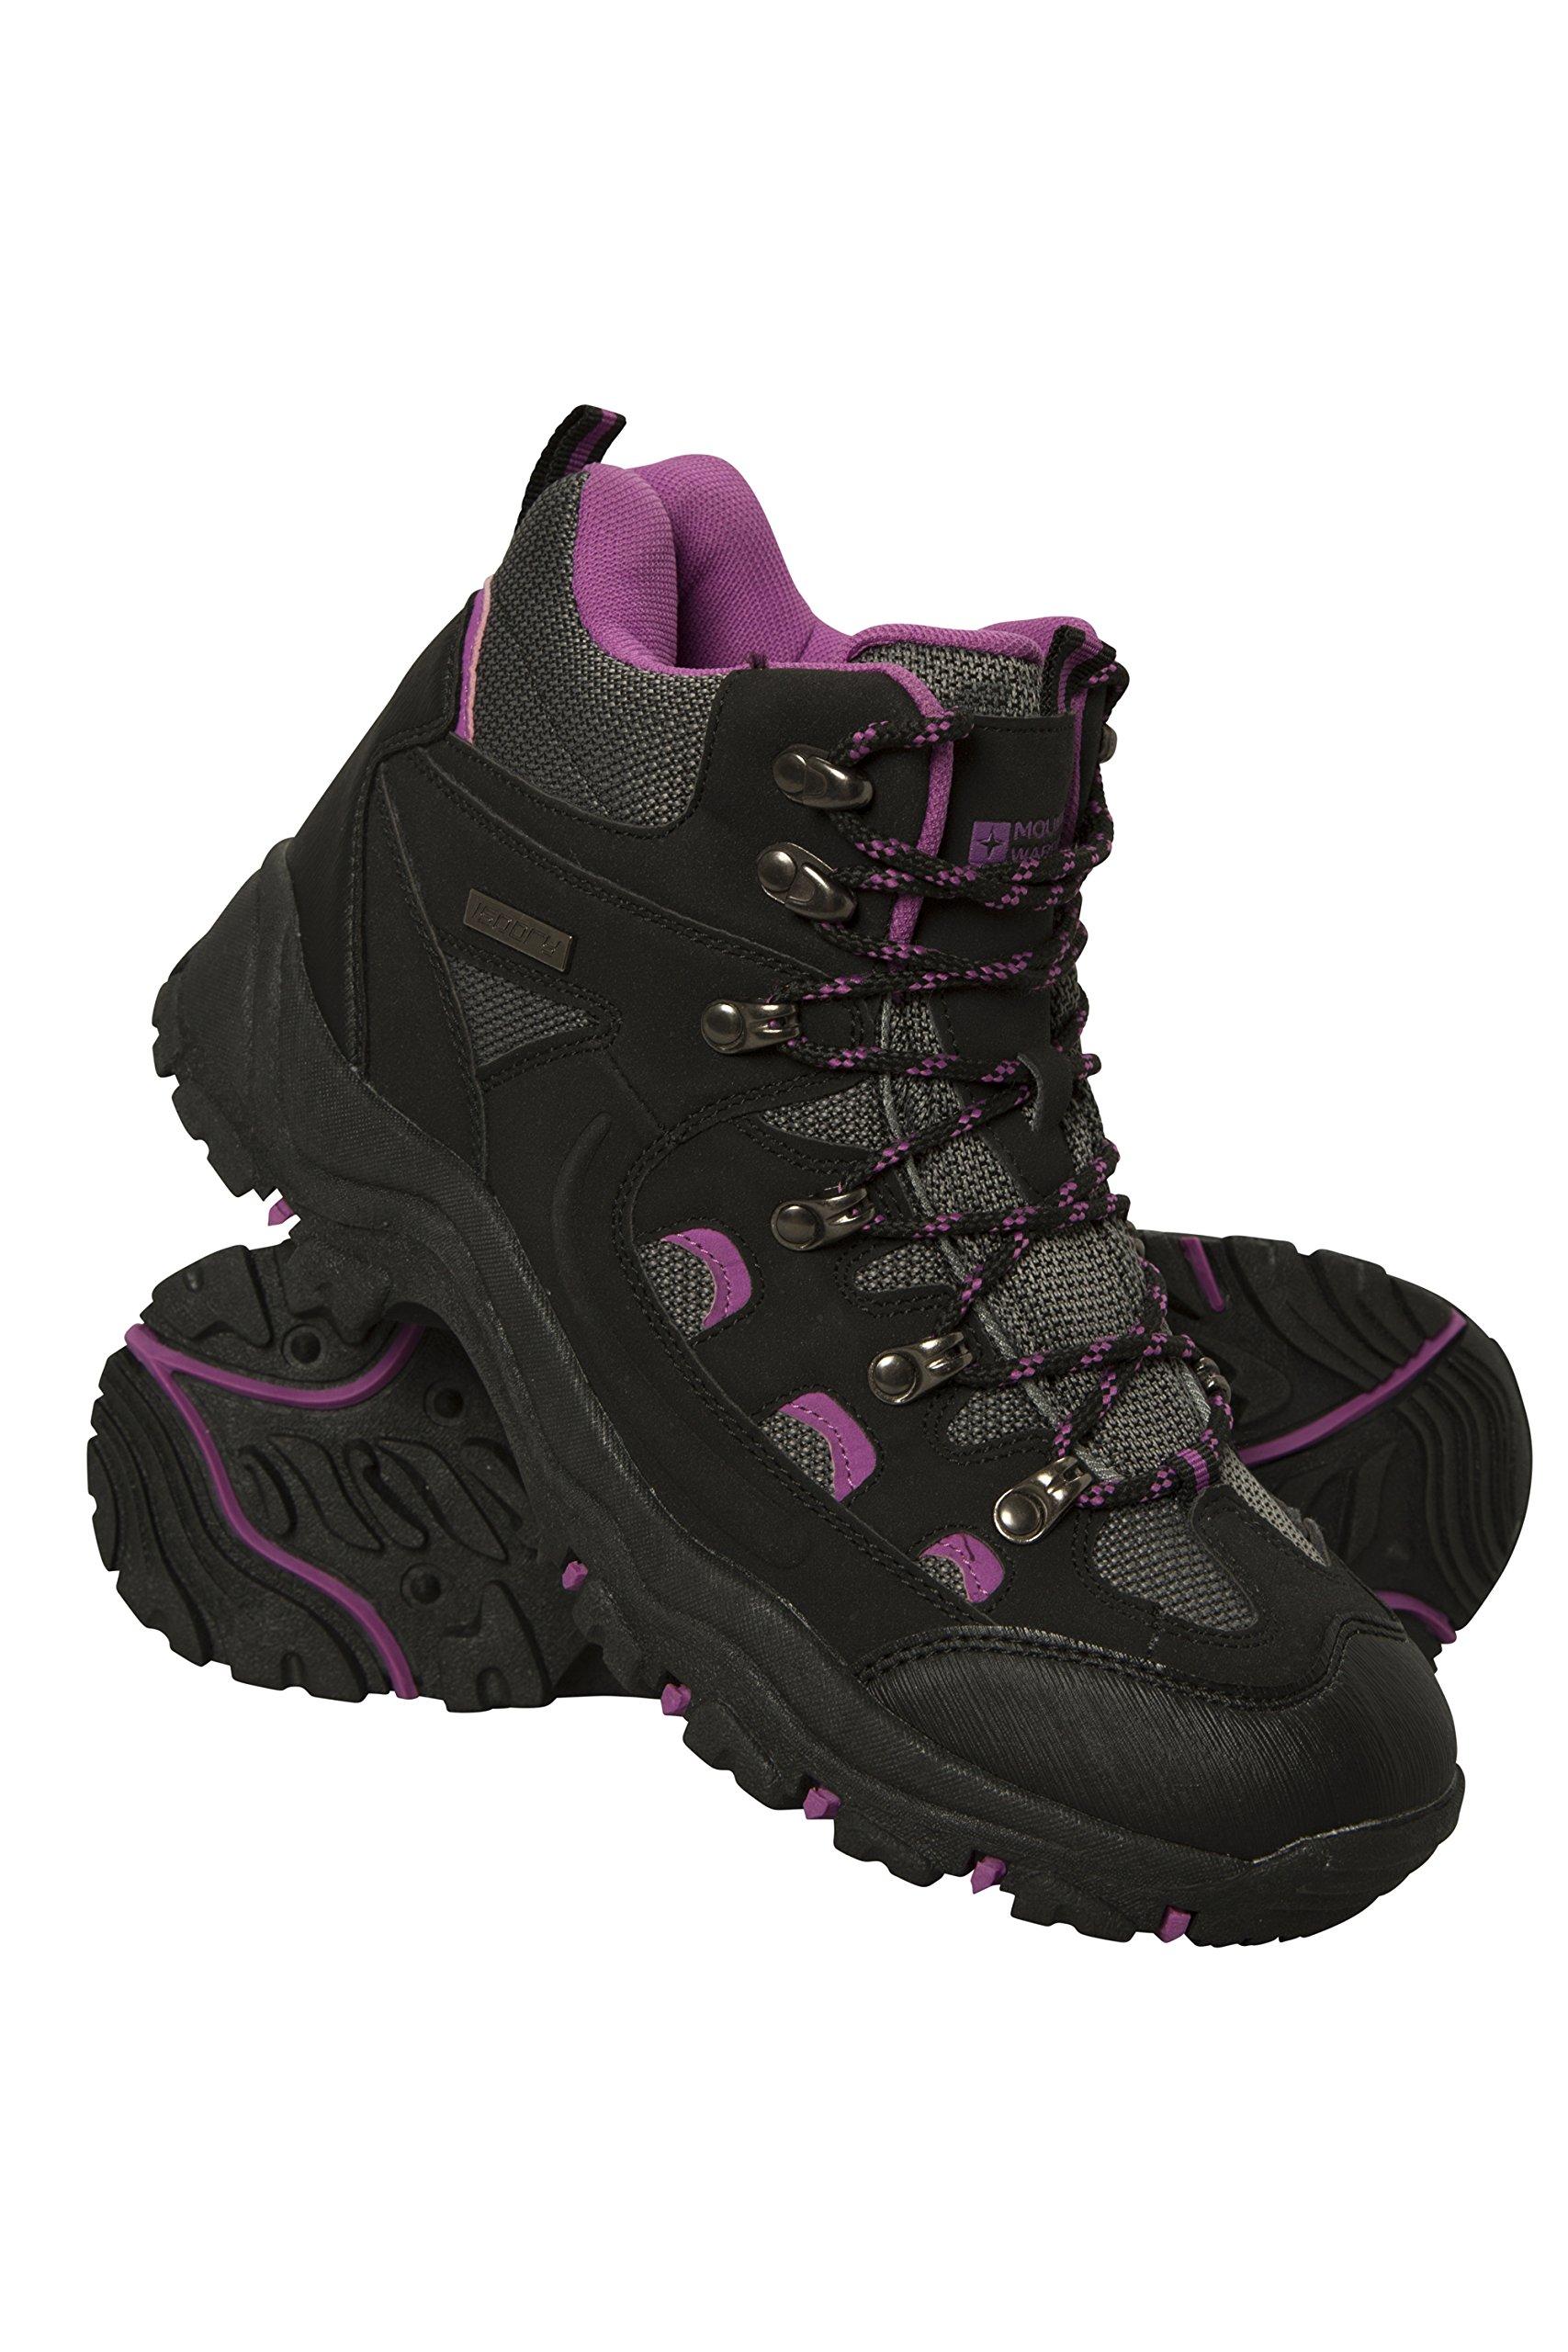 Mountain Warehouse Adventurer Womens Waterproof Hiking Boots